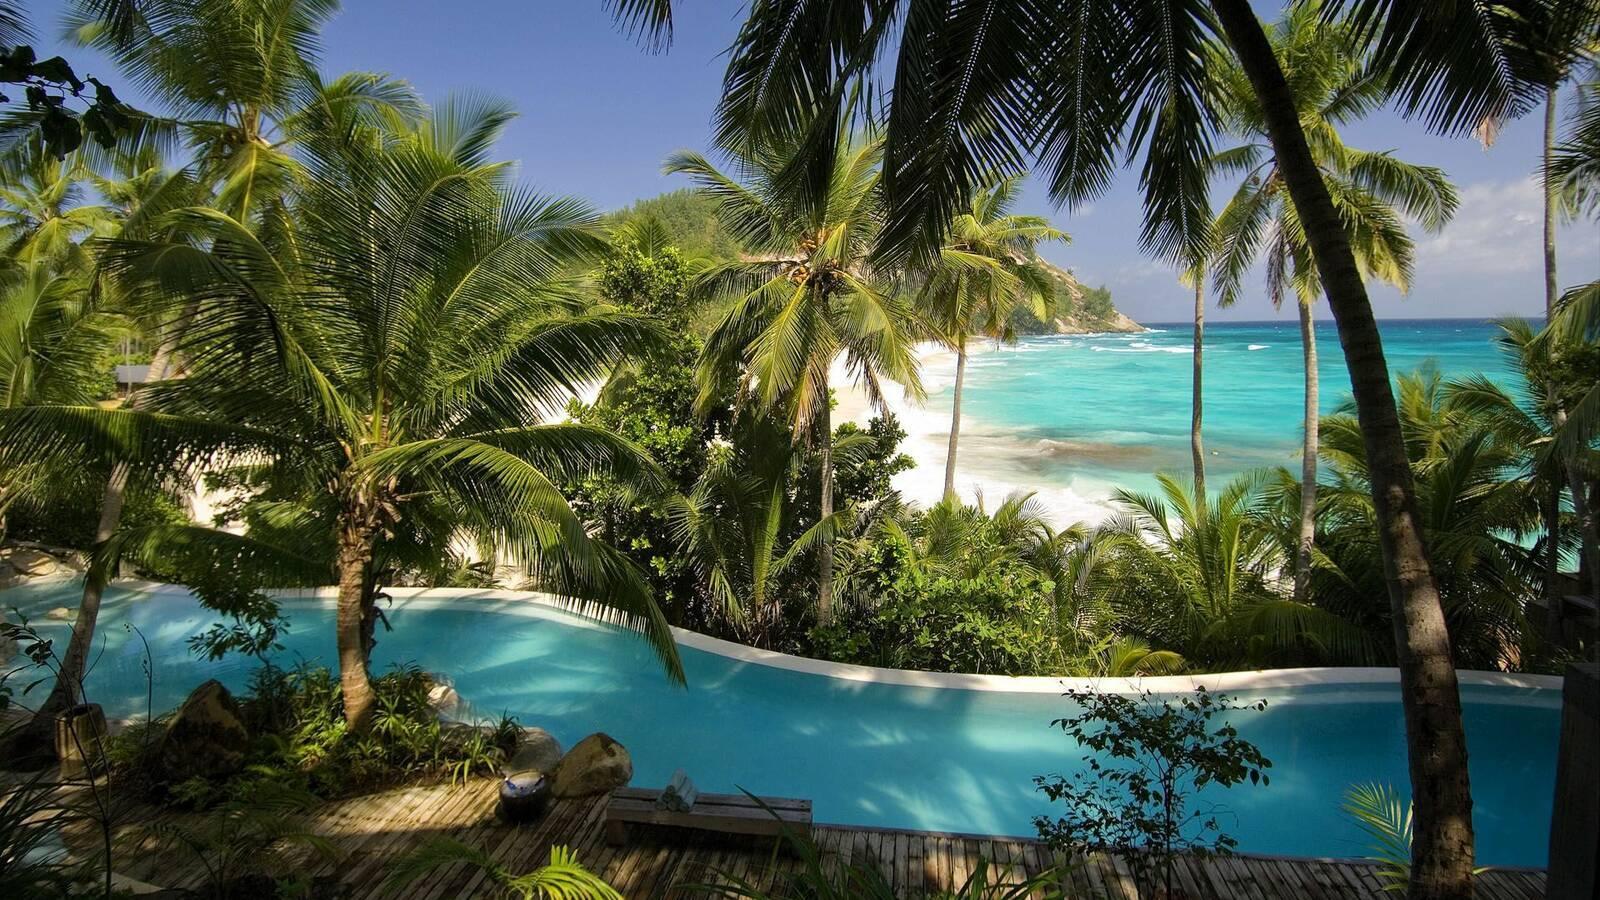 North Island Piscine Seychelles